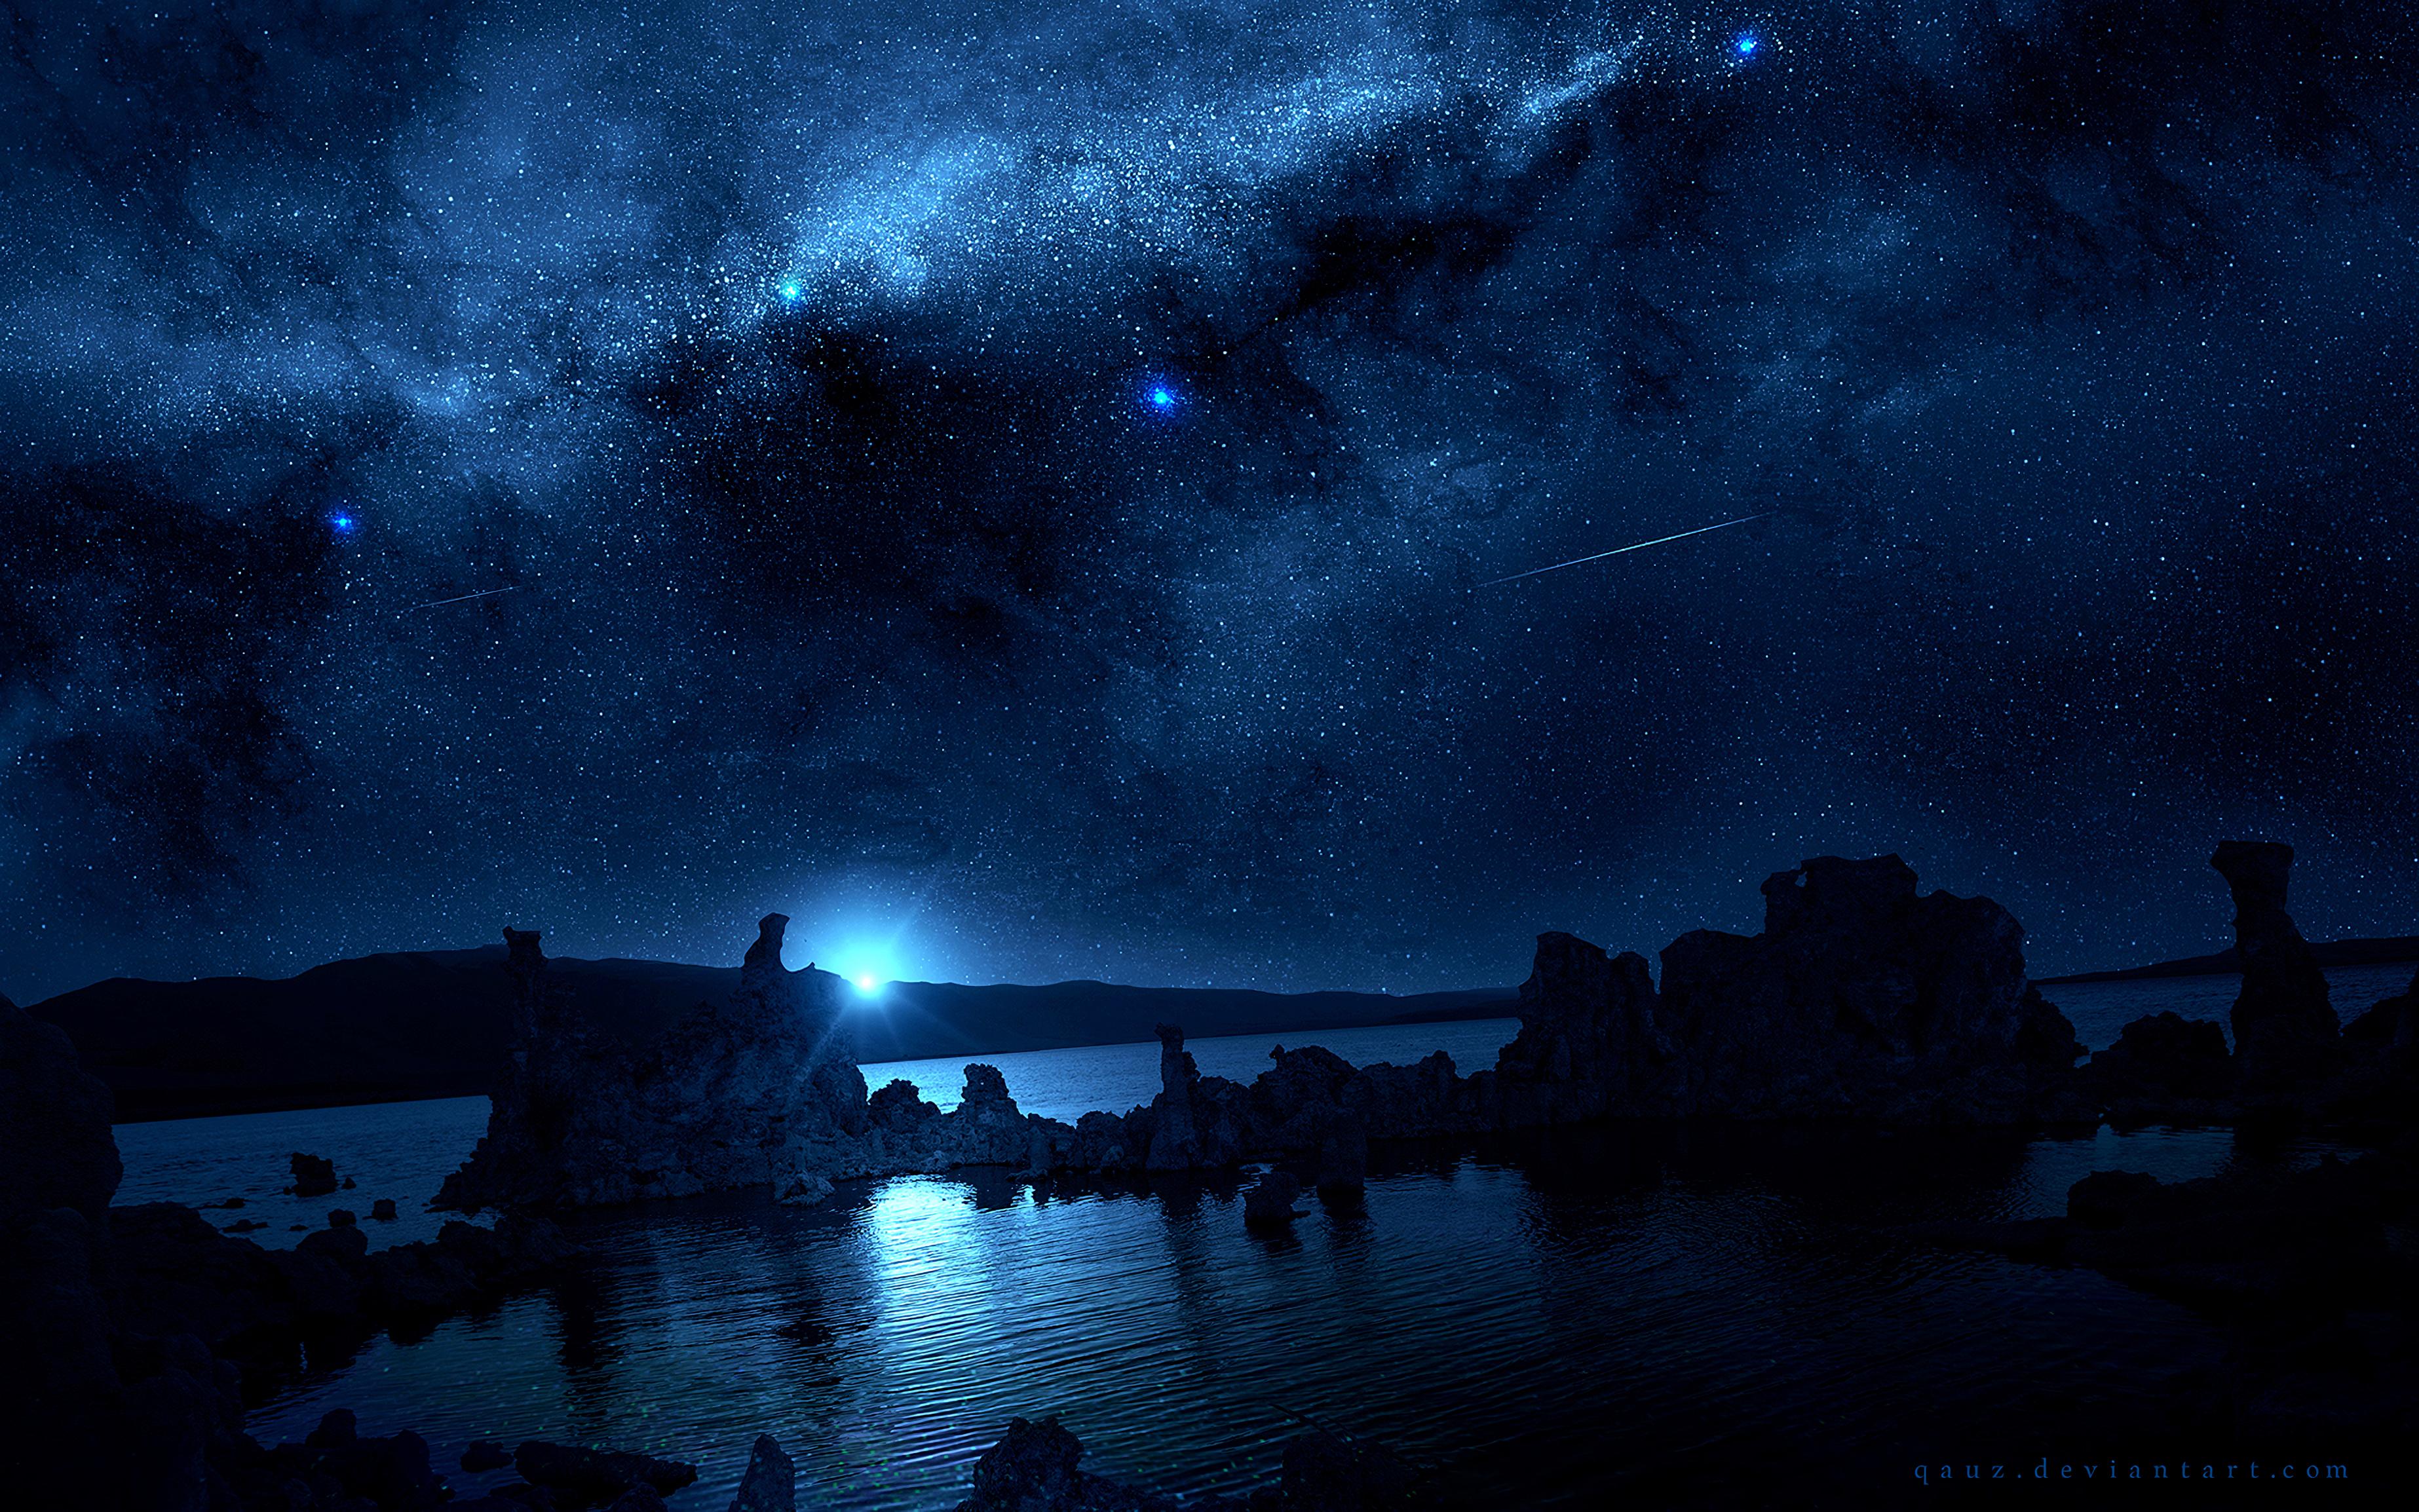 General 3692x2308 digital digital art artwork fantasy art night sky landscape nature skyscape starry night blue comet shooting stars lights rocks water sea reflection spacescapes galaxy space universe Milky Way